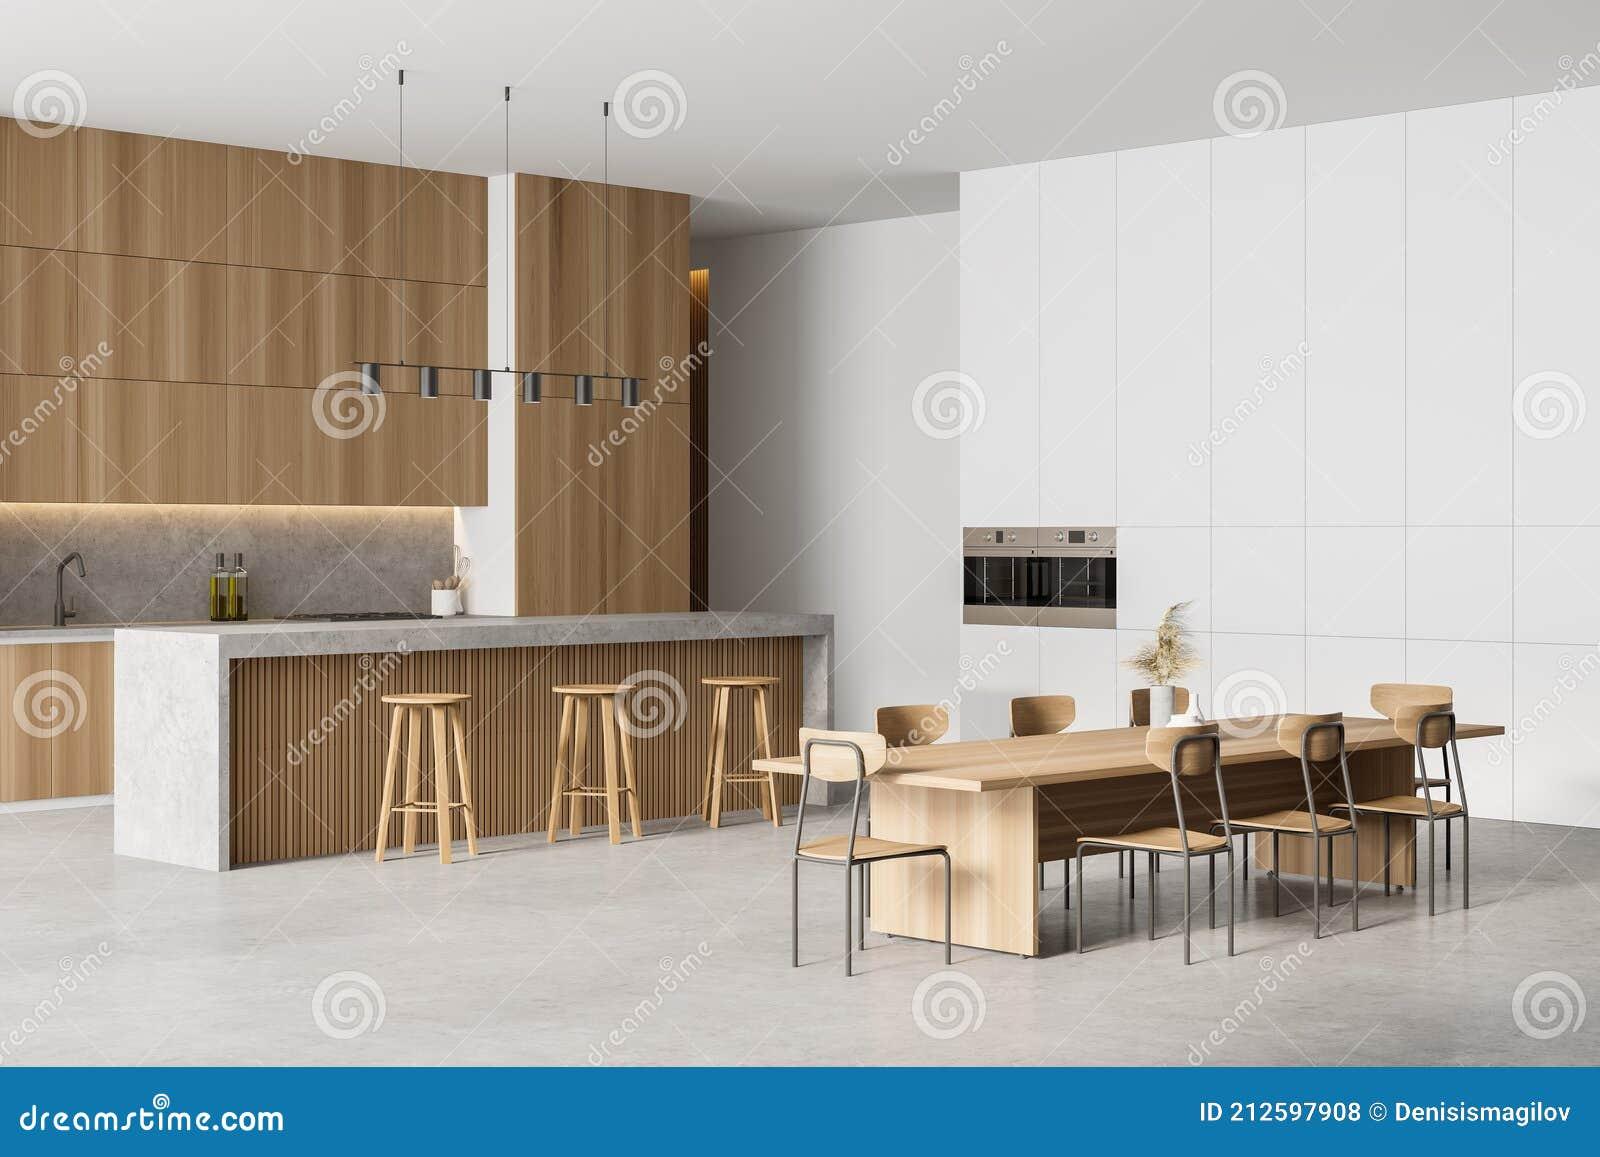 Kitchen With Wooden Minimalist Furniture On Marble Stock ...